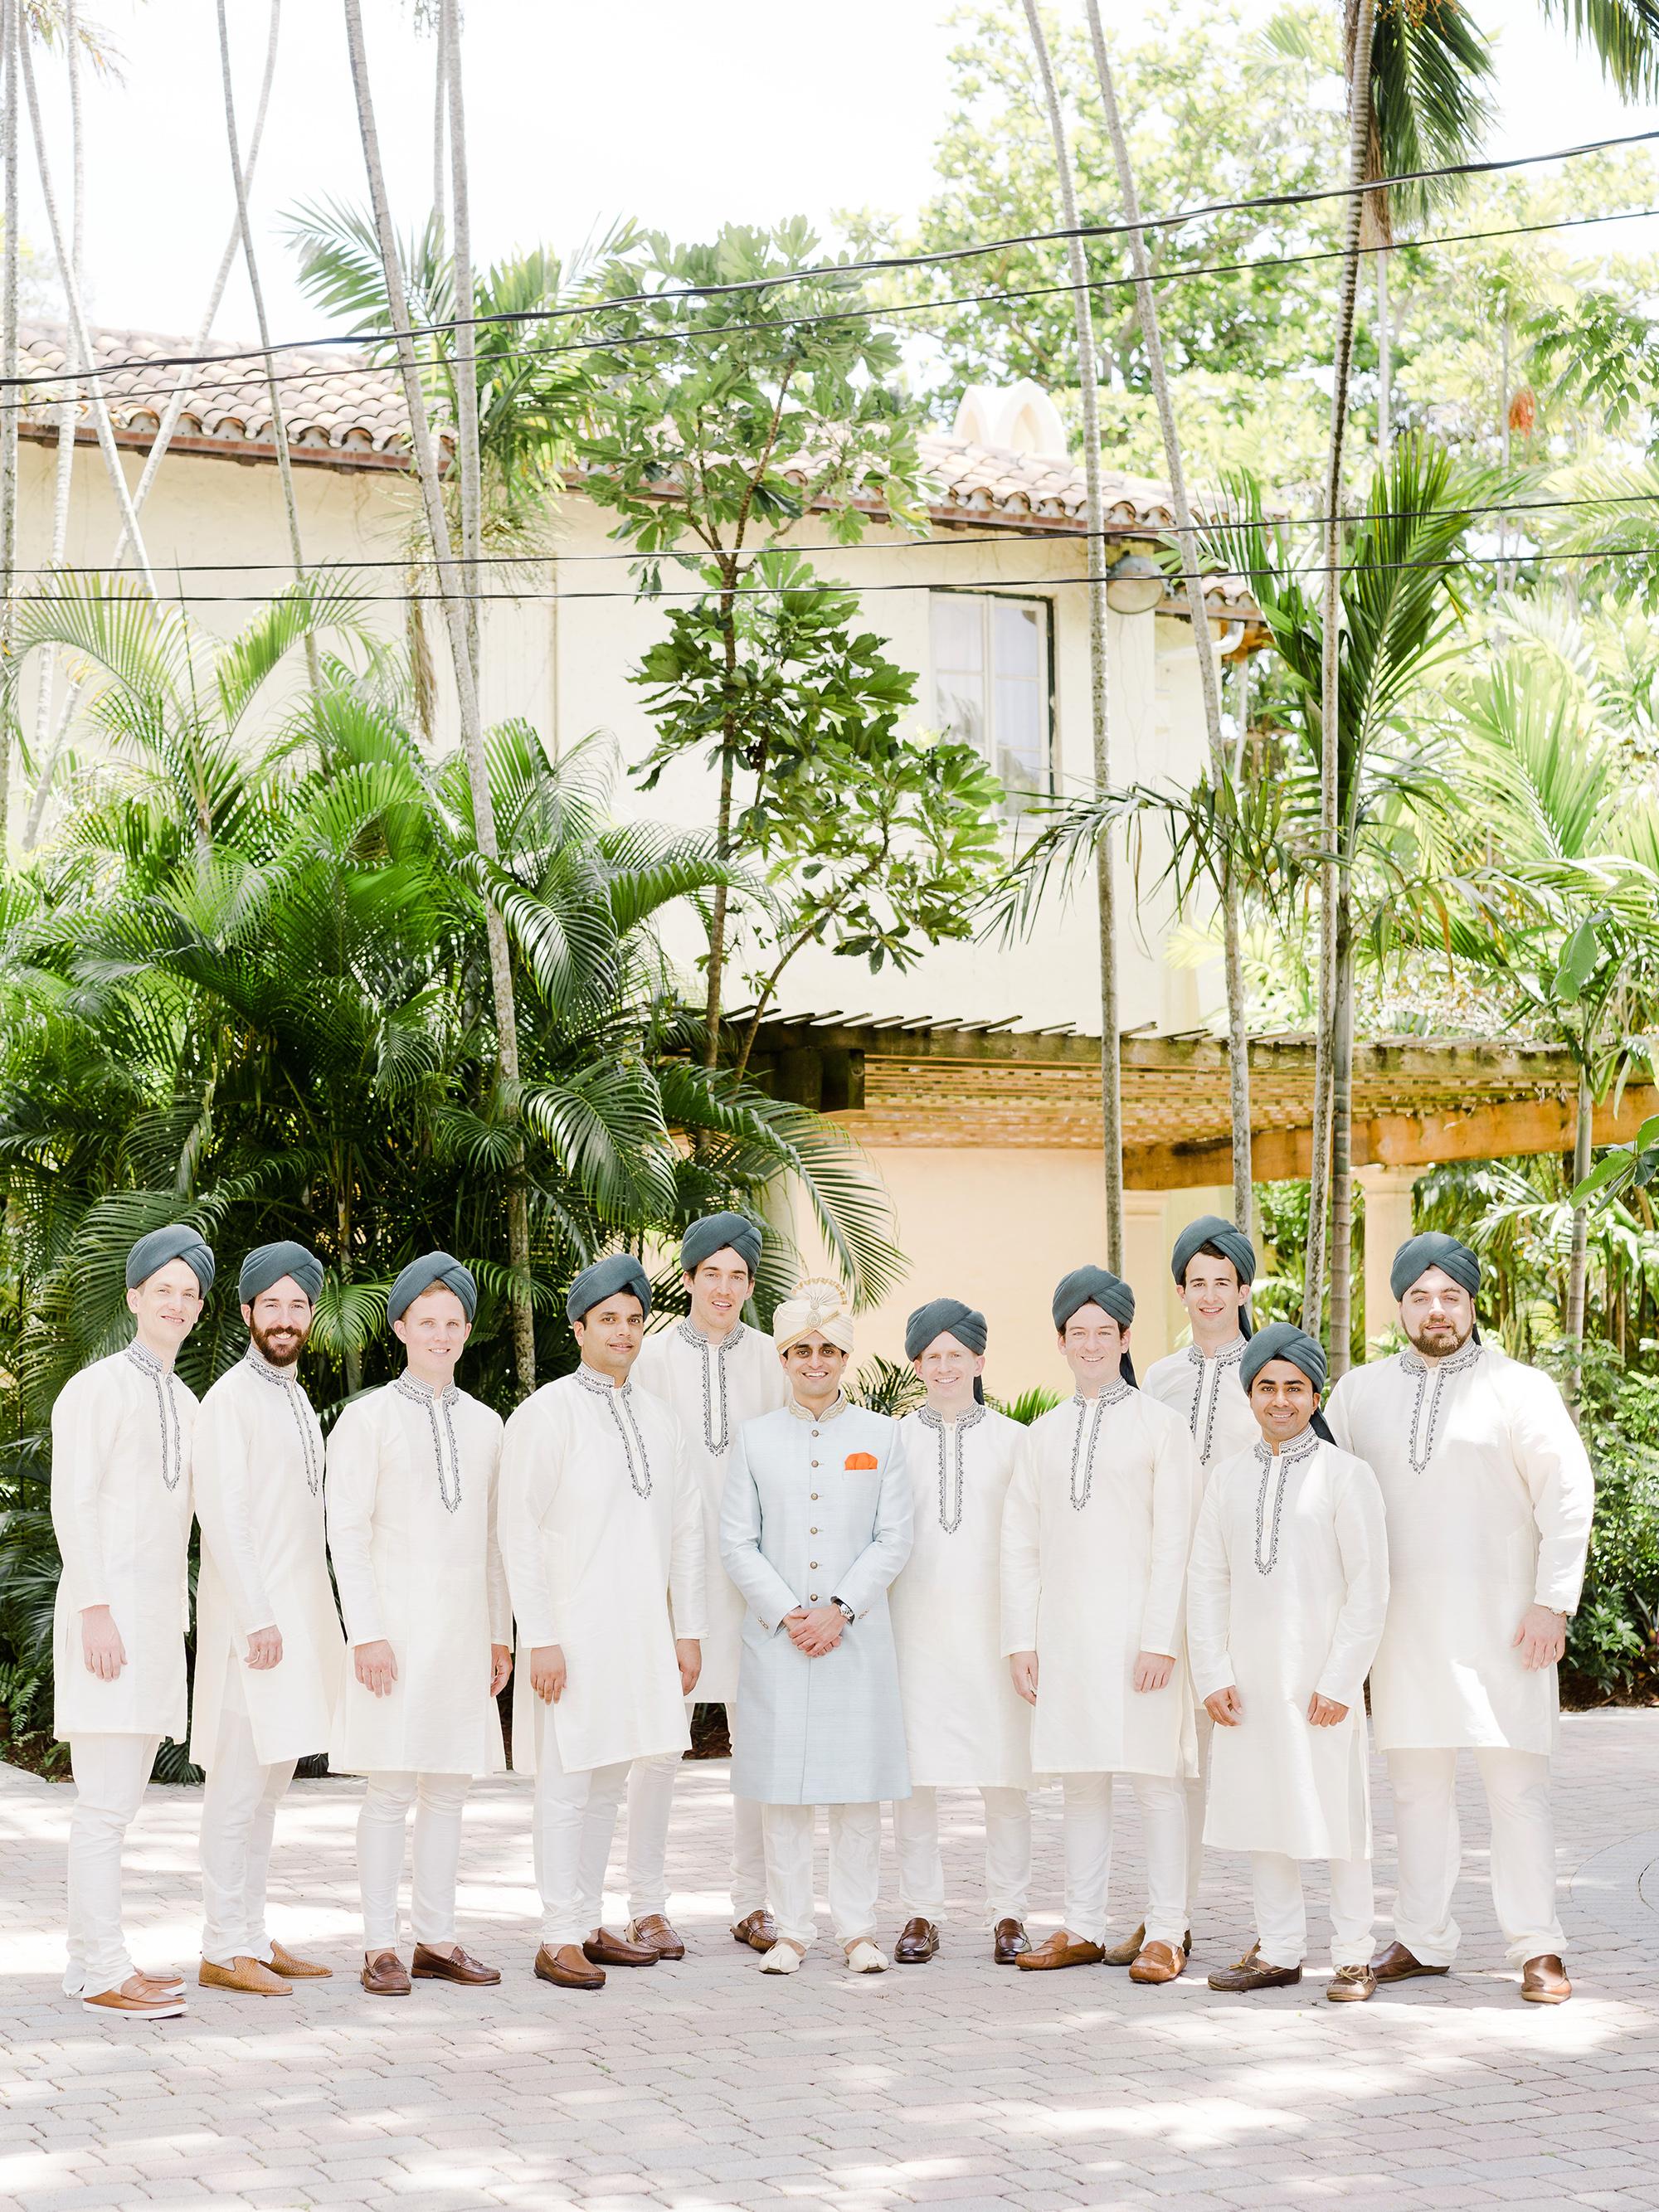 anuja nikhil wedding groomsmen